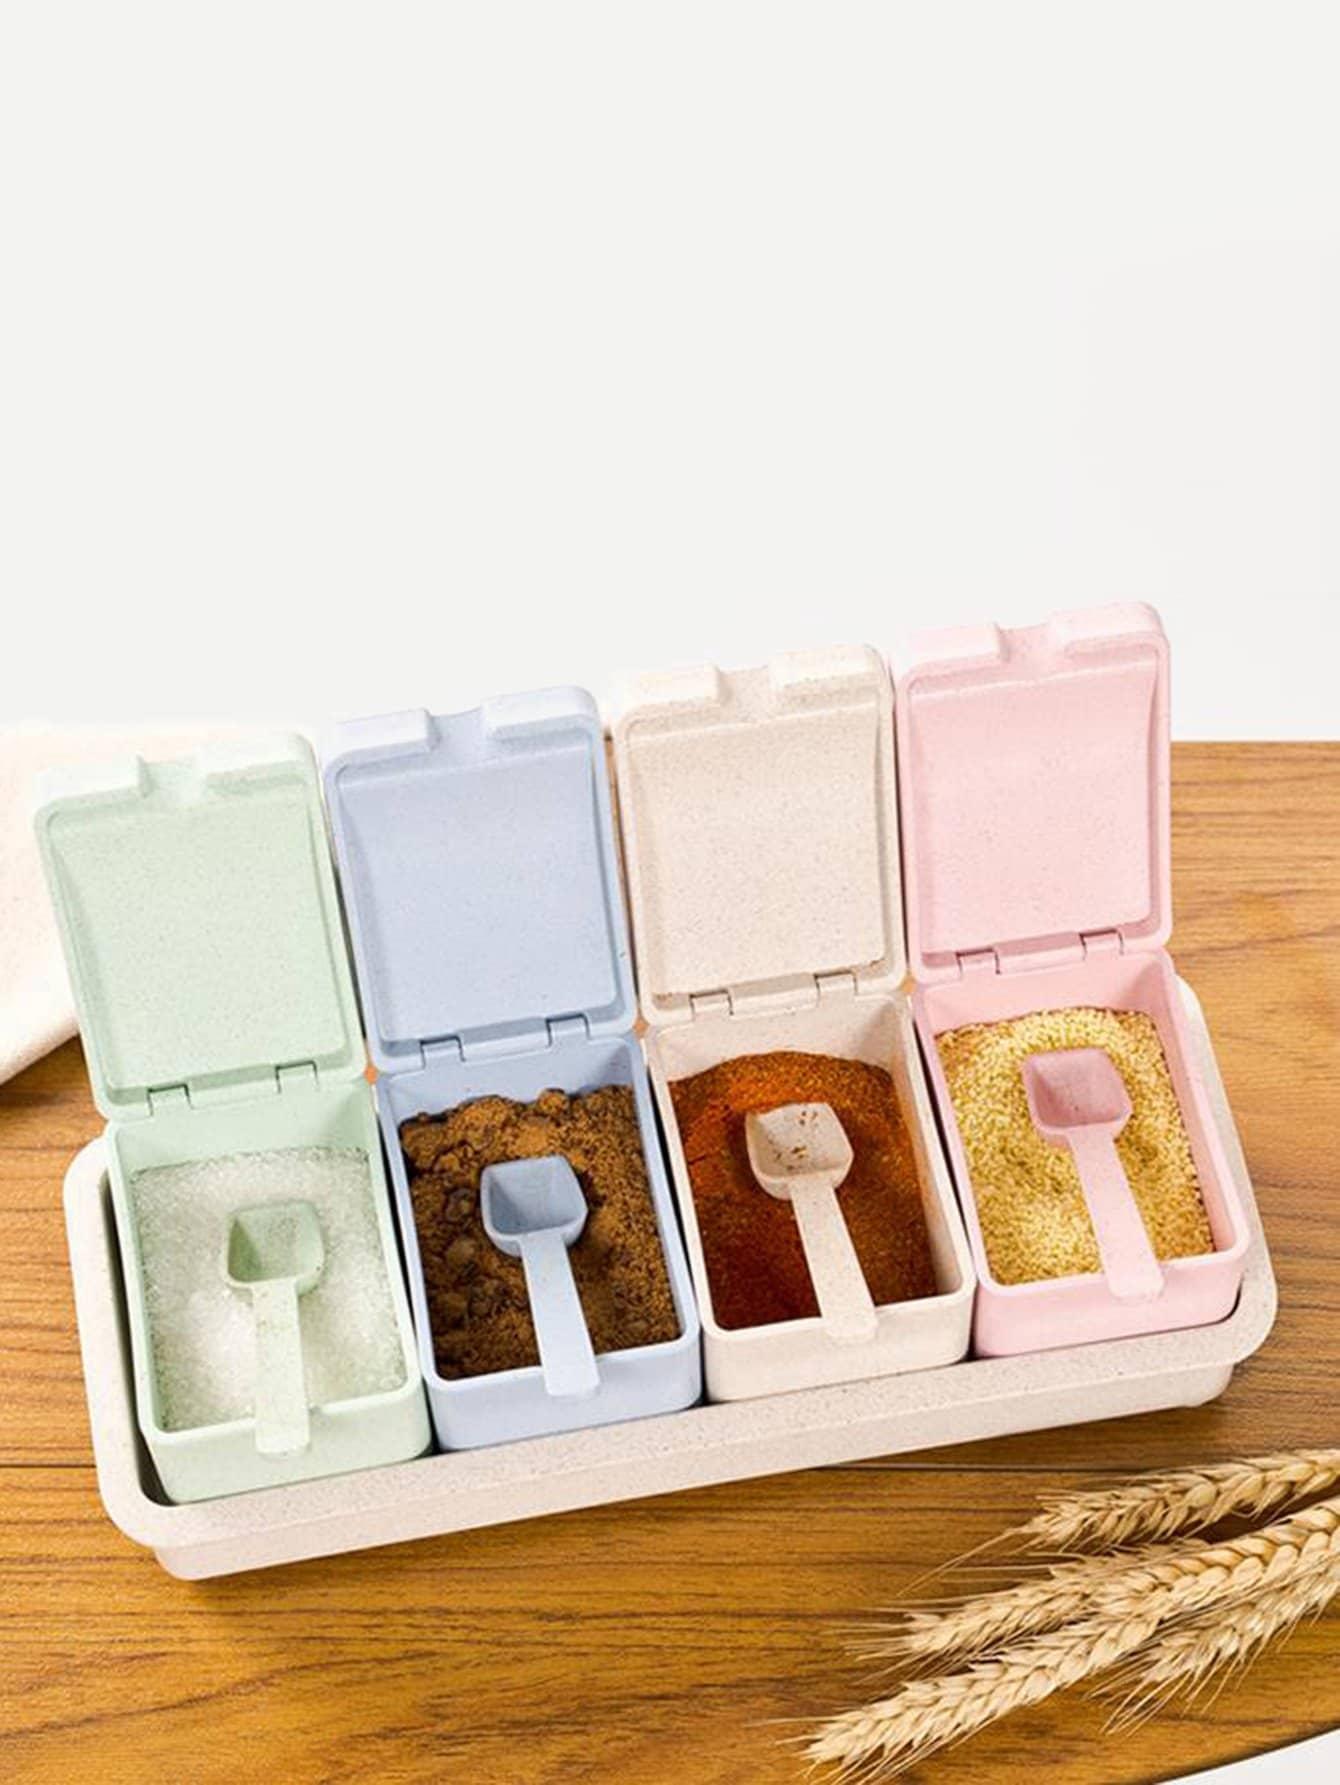 Купить Spice Container & Spoon, null, SheIn